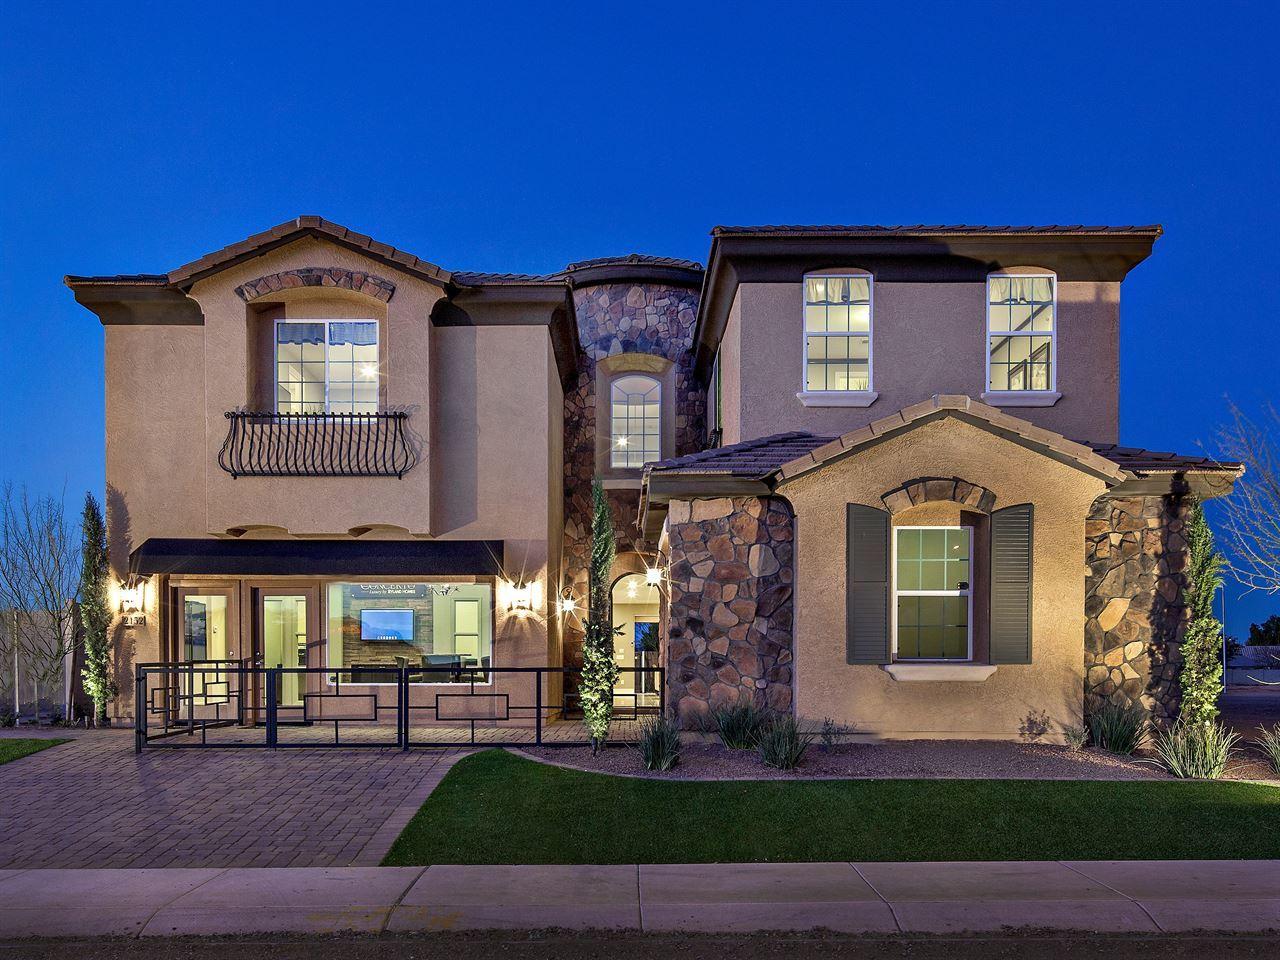 Single Family for Sale at 209 Plan 2170 E Geronimo Street Chandler, Arizona 85225 United States